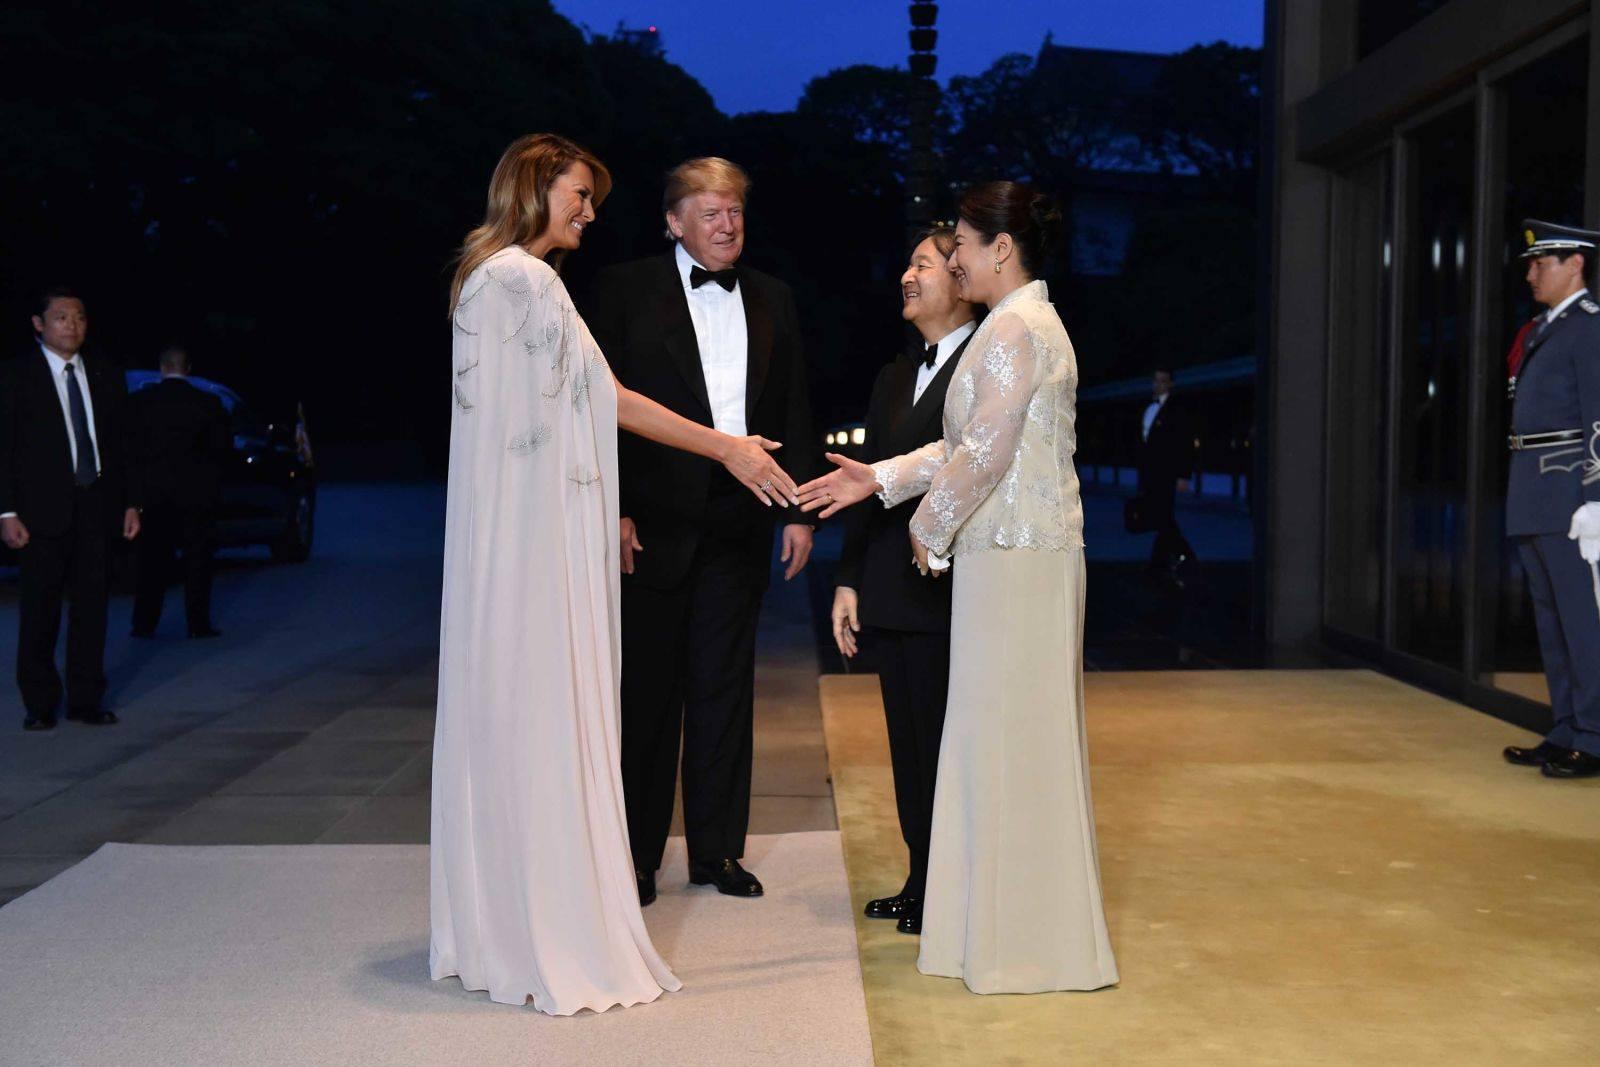 Where President Trump bought a viola for Emperor Naruhito